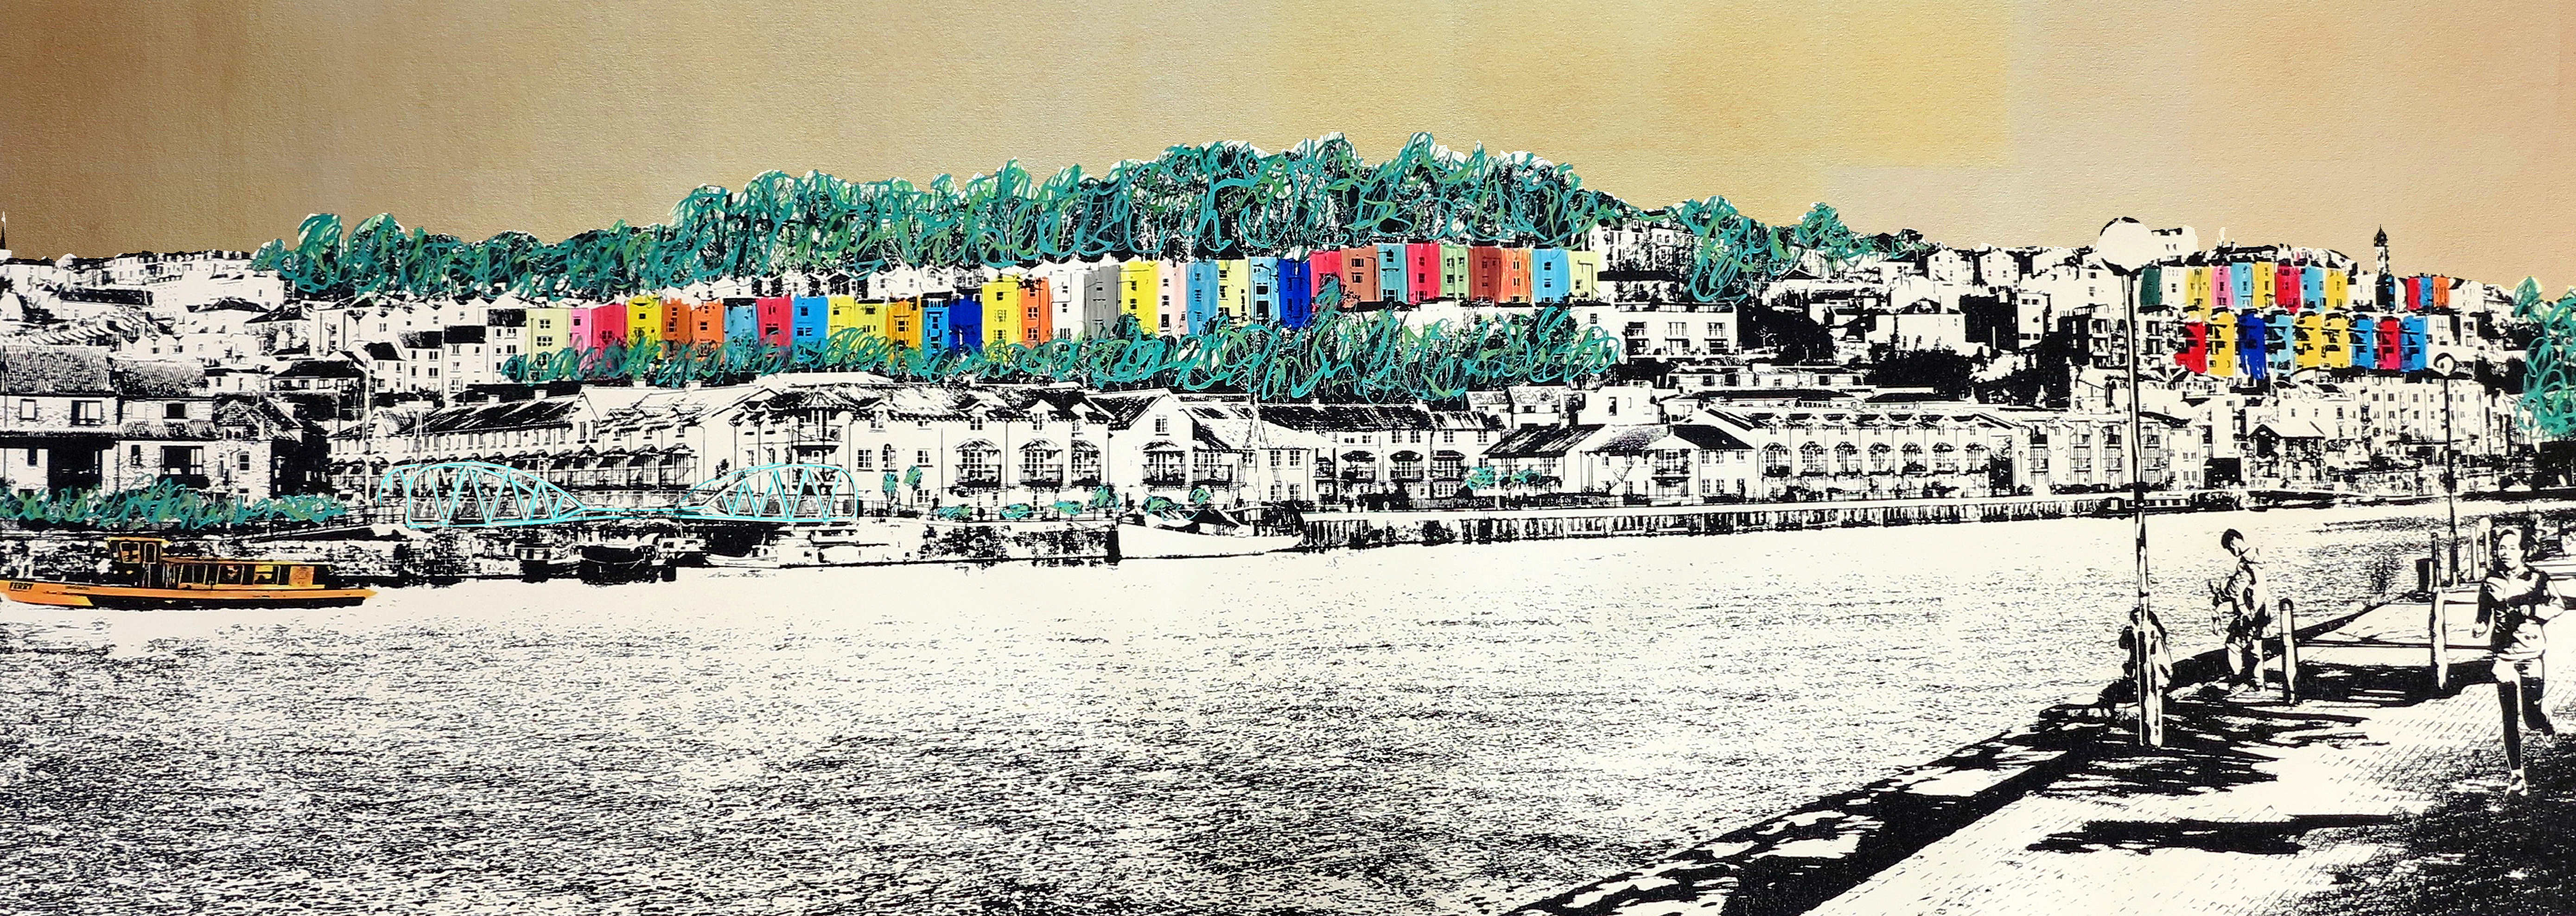 Bristol web 5.jpg